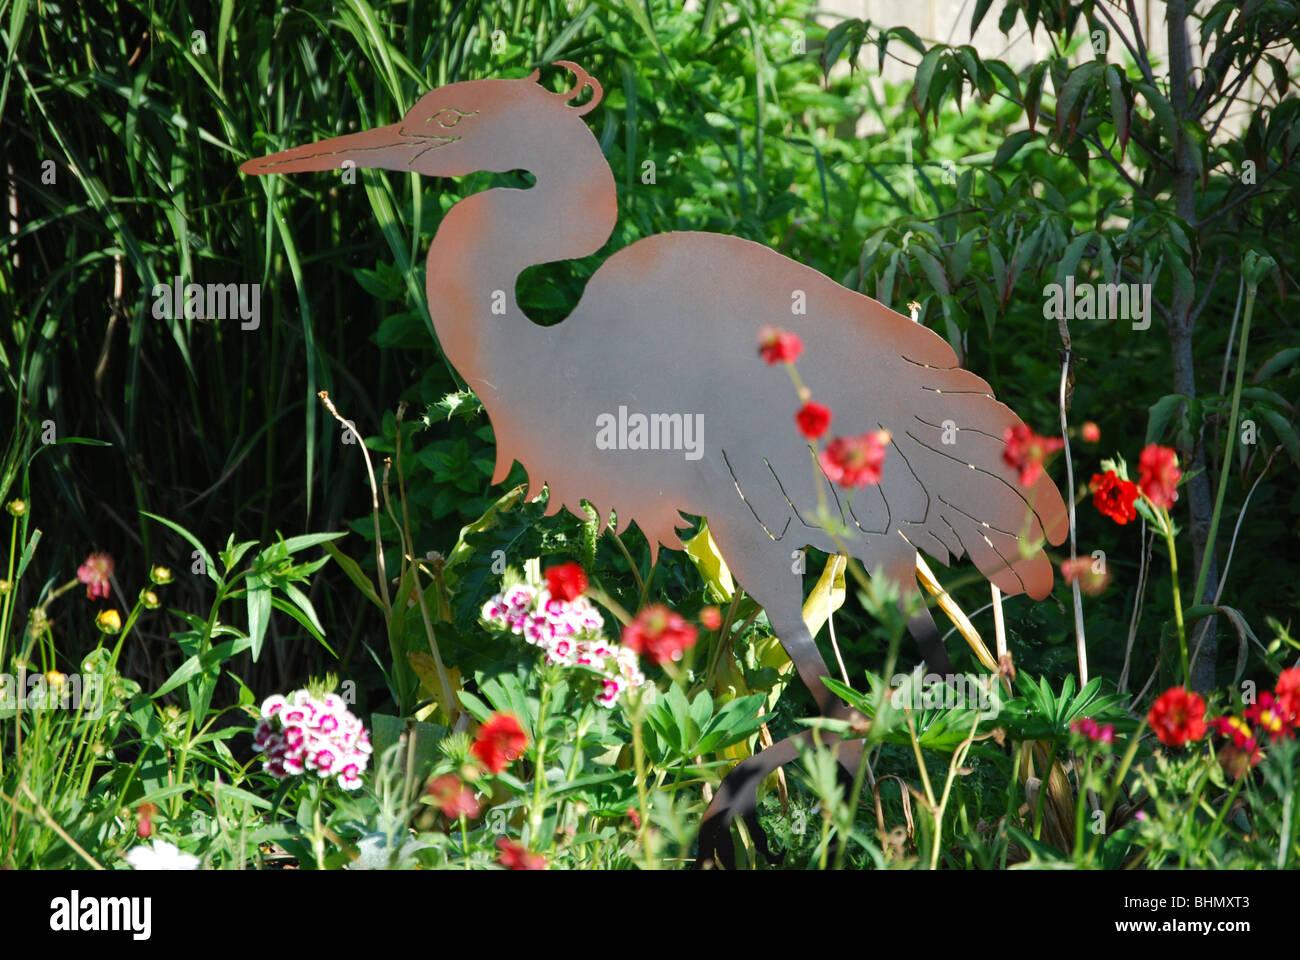 Heron garden ornament - A Metal Garden Sculpture Of A Great Blue Heron In A Home Flower Garden